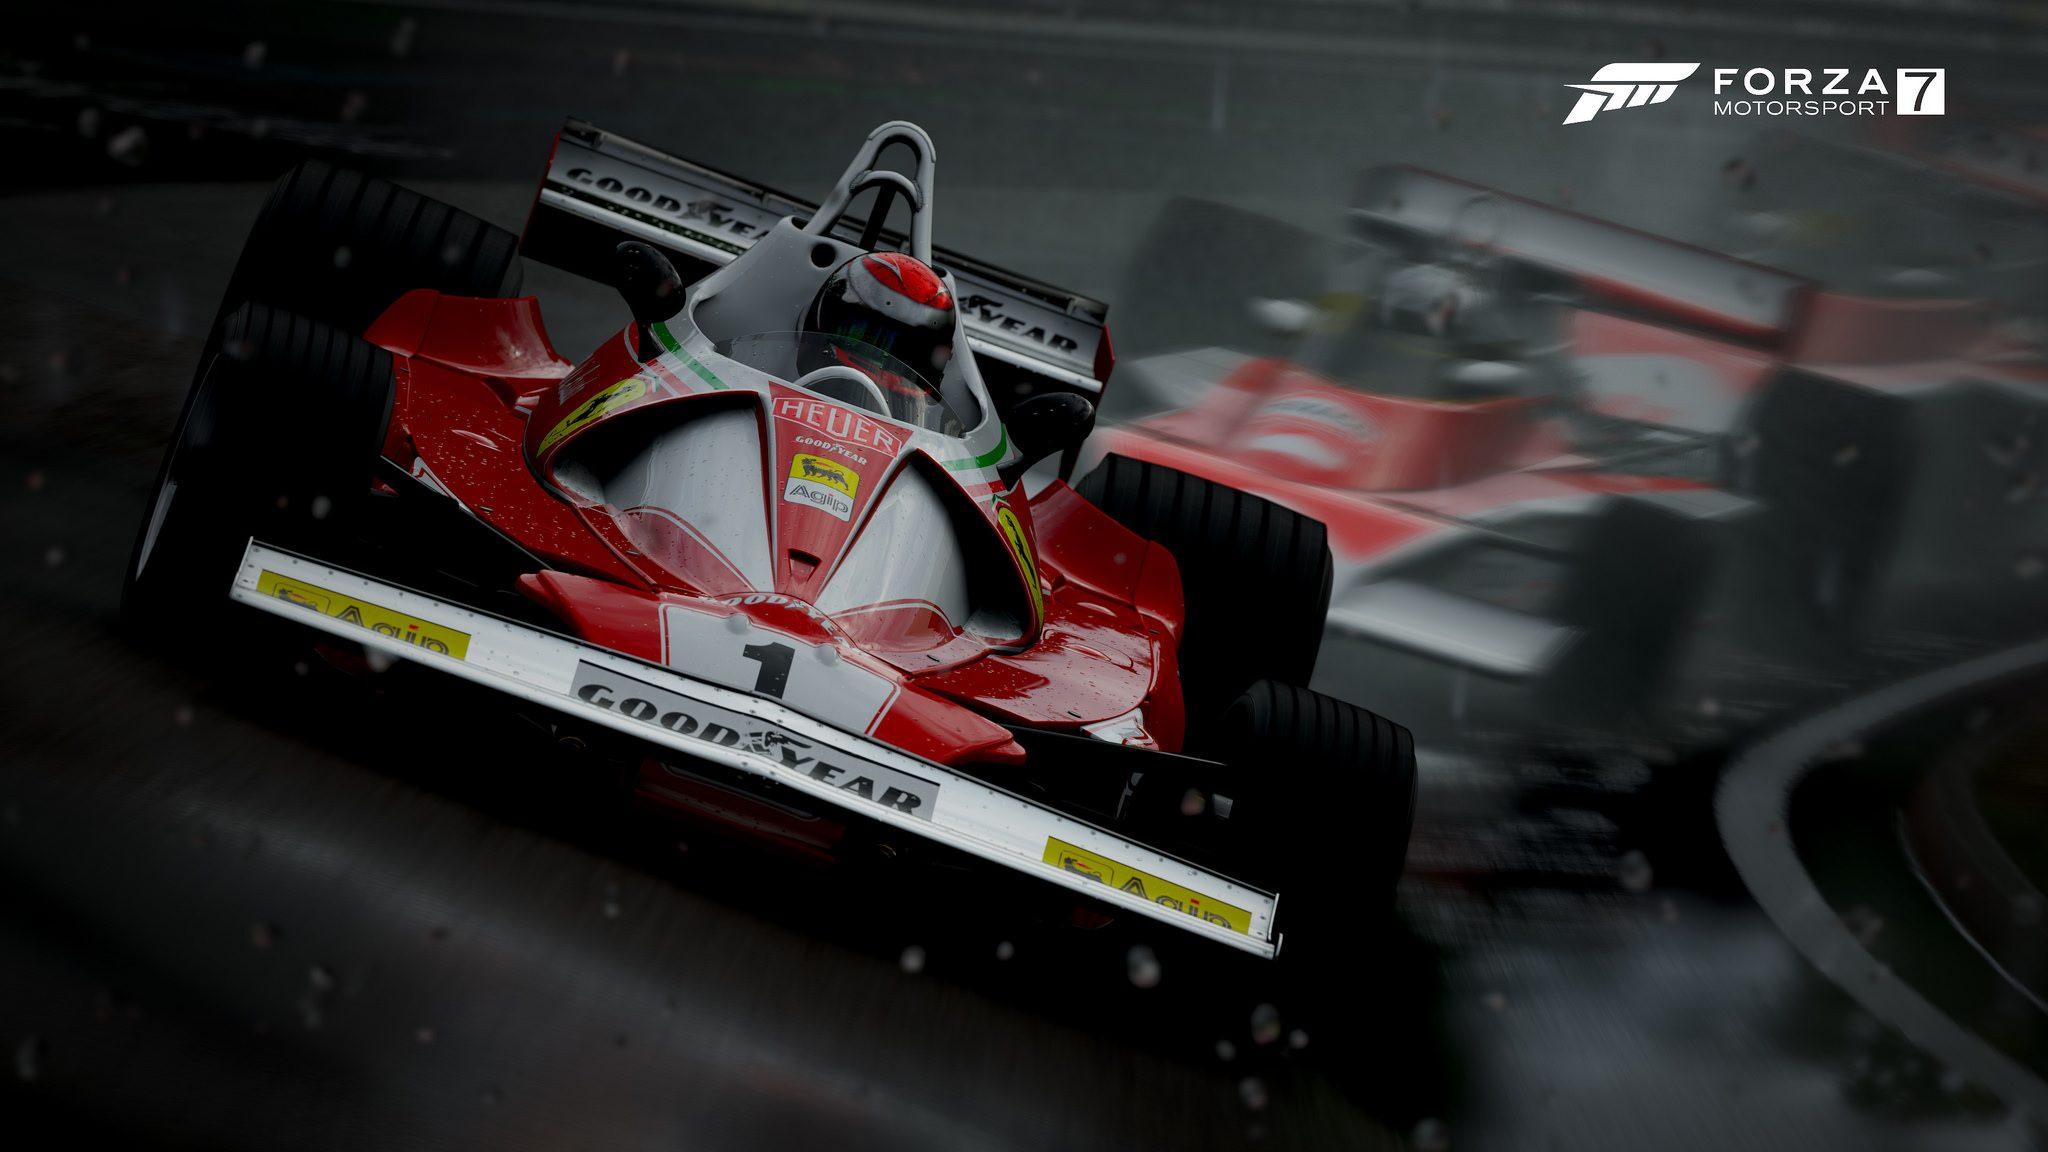 Forza-Motorsport-7-Ferrari-312-T2-GTDNick72.jpg